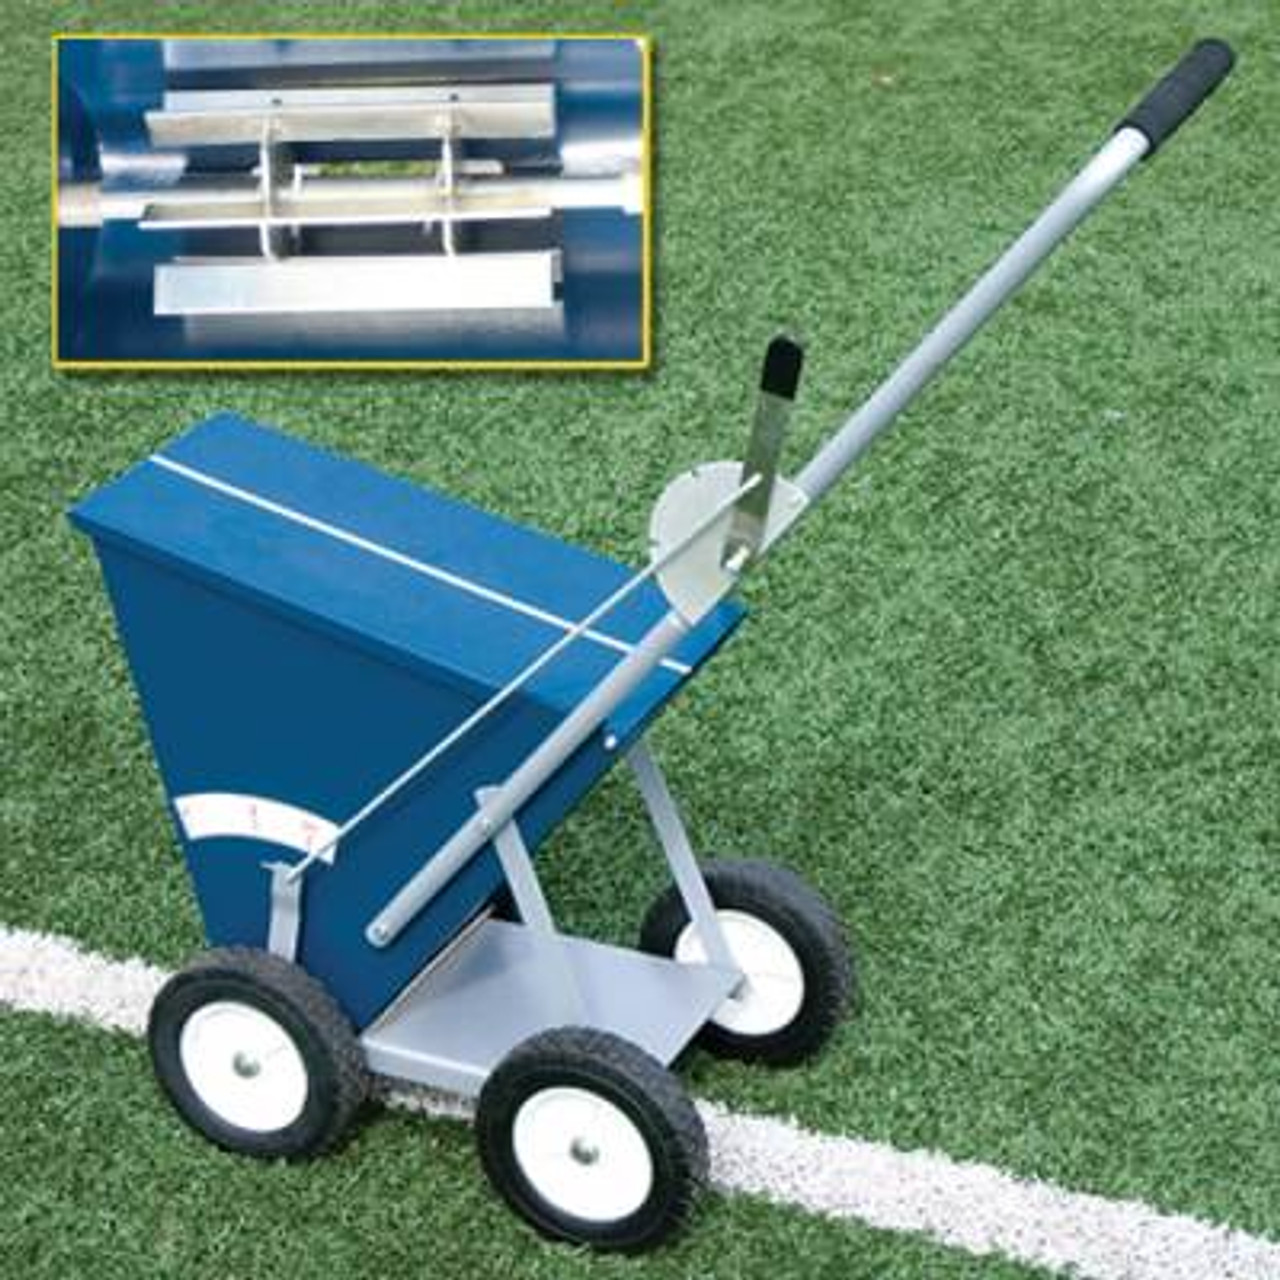 4 Wheel Dry Line Marker (65 lb. capacity)